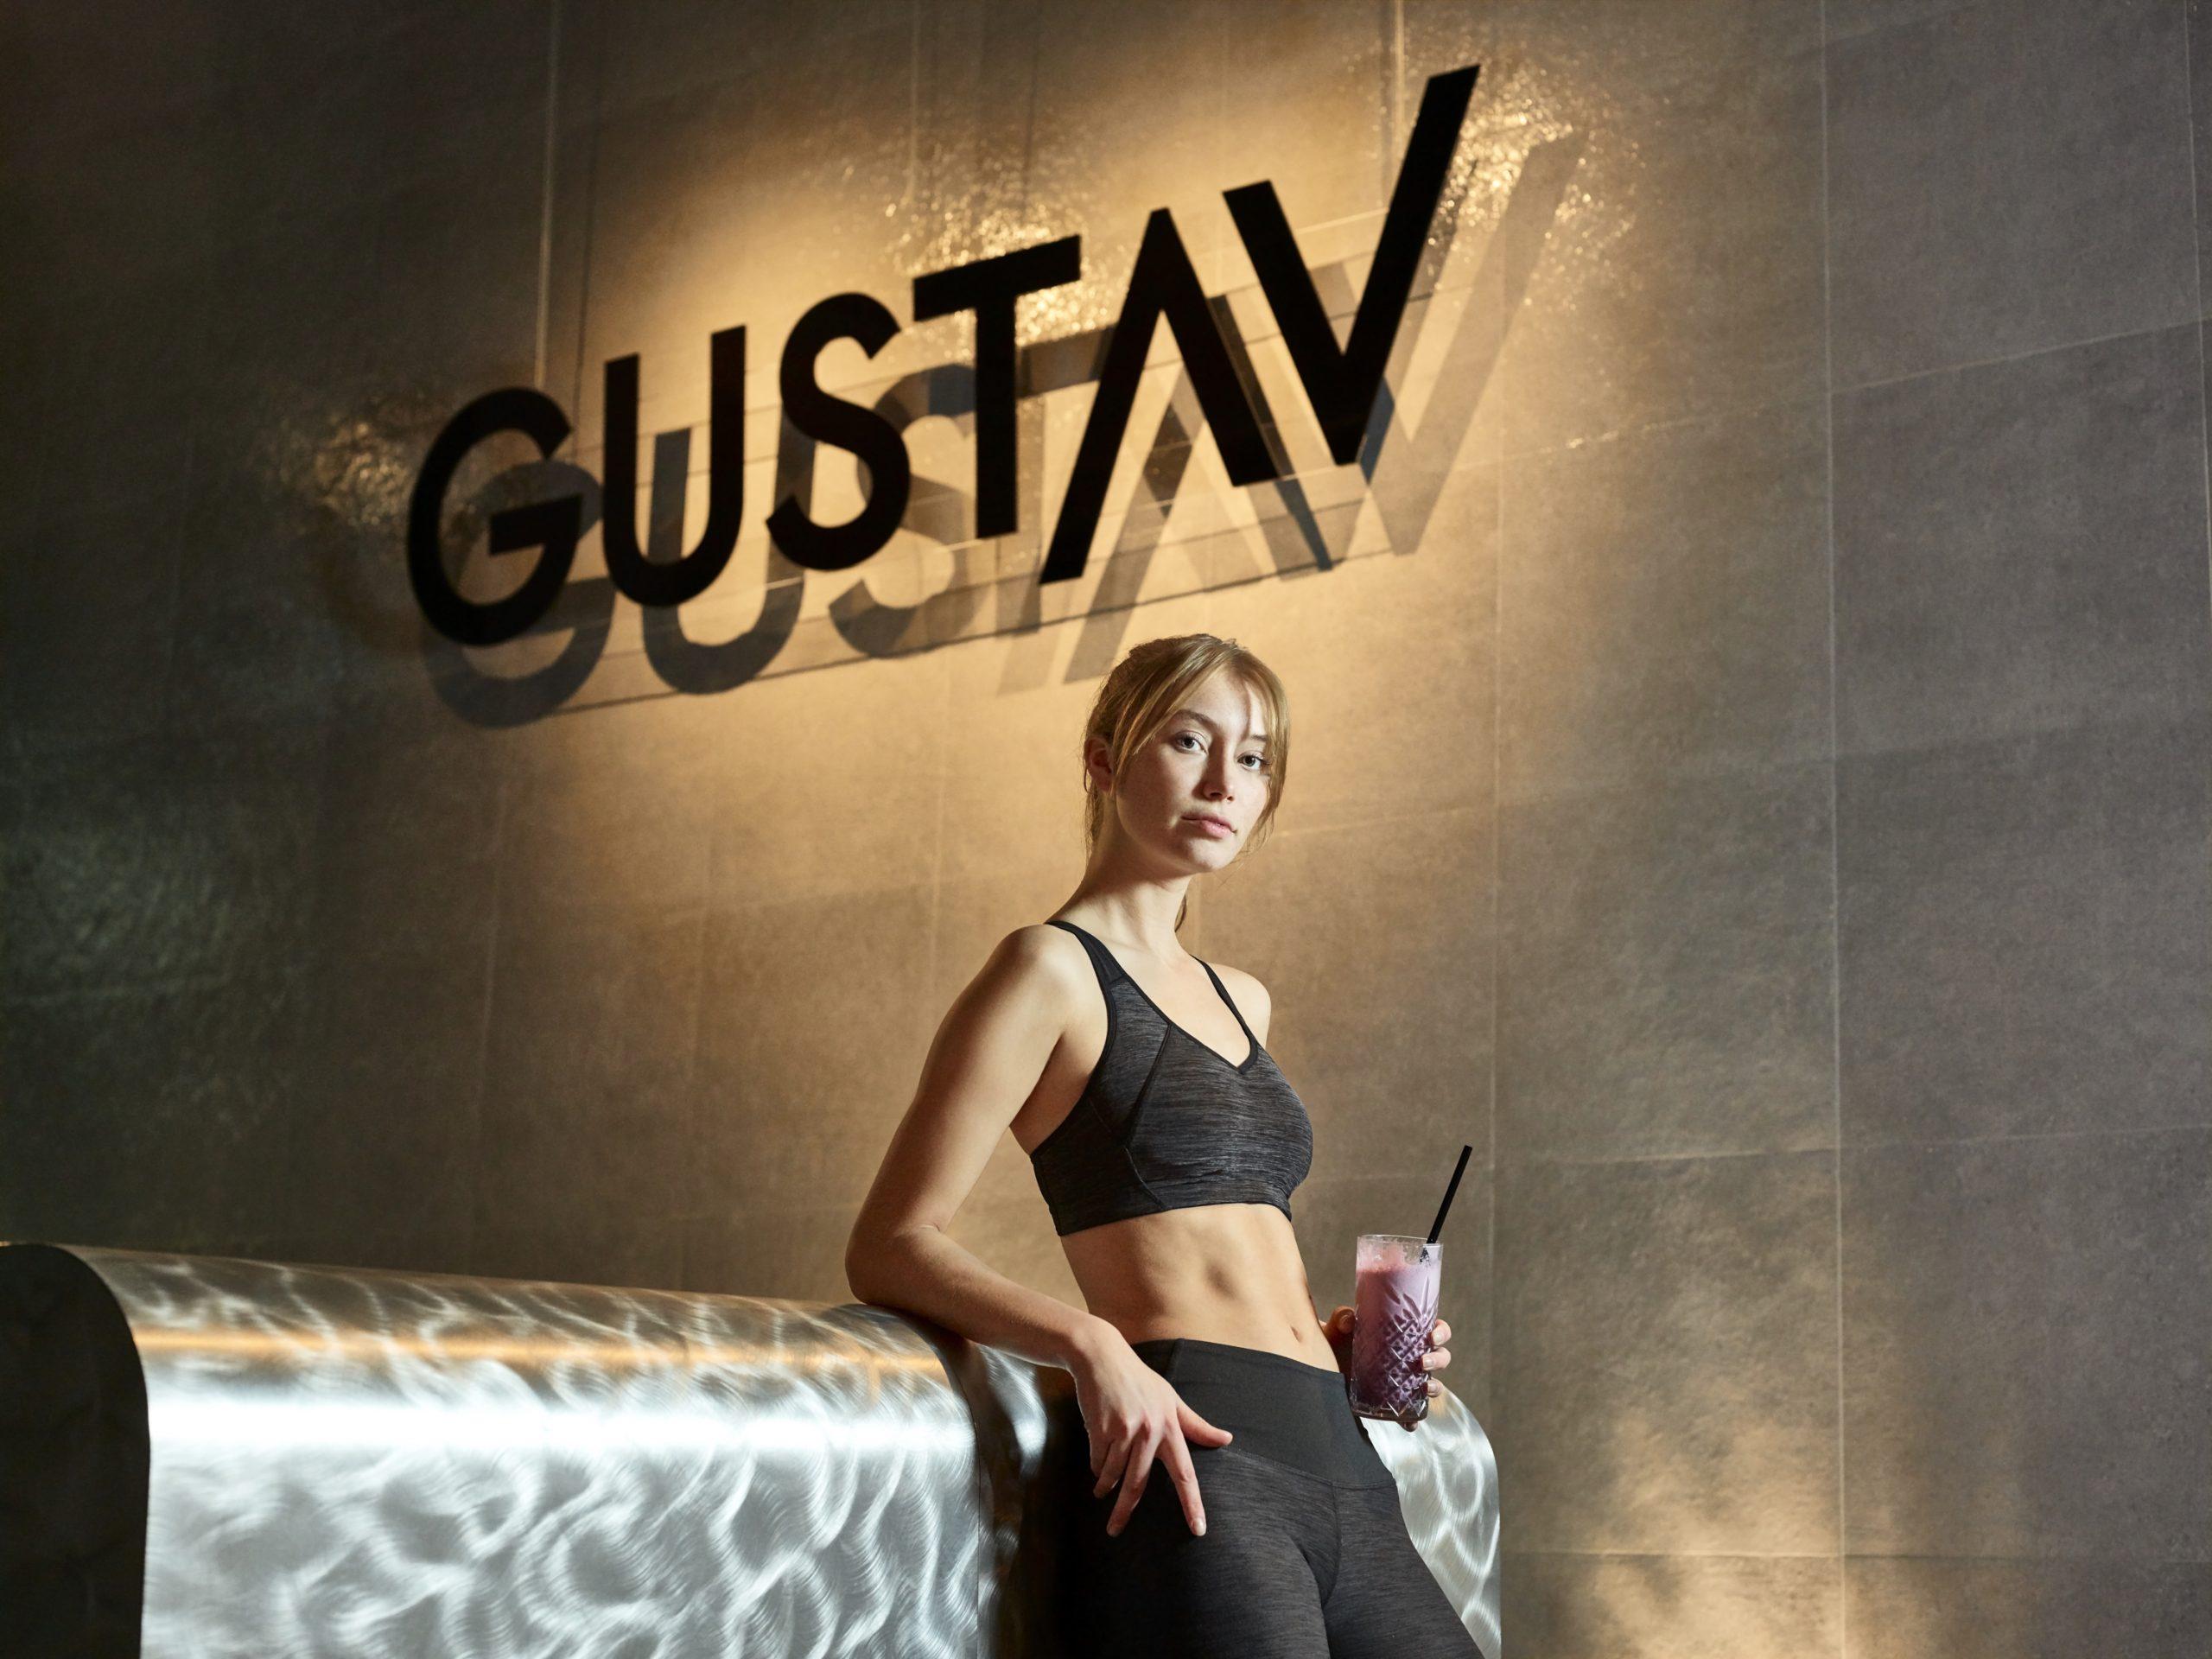 Gustav Gym Sport Bedrijfs fotografie